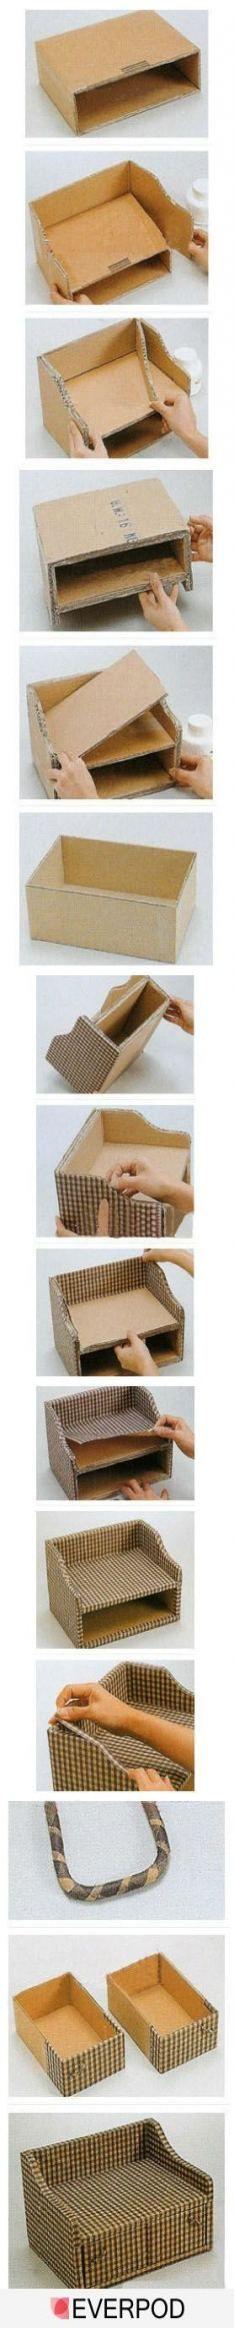 Craft Cardboard Box Diy Storage Ideas For 2019 Desk Organization Diy, Diy Desk, Ikea Desk, Organising, Organizing Ideas, Cute Crafts, Diy And Crafts, Crafts For Kids, Cardboard Furniture